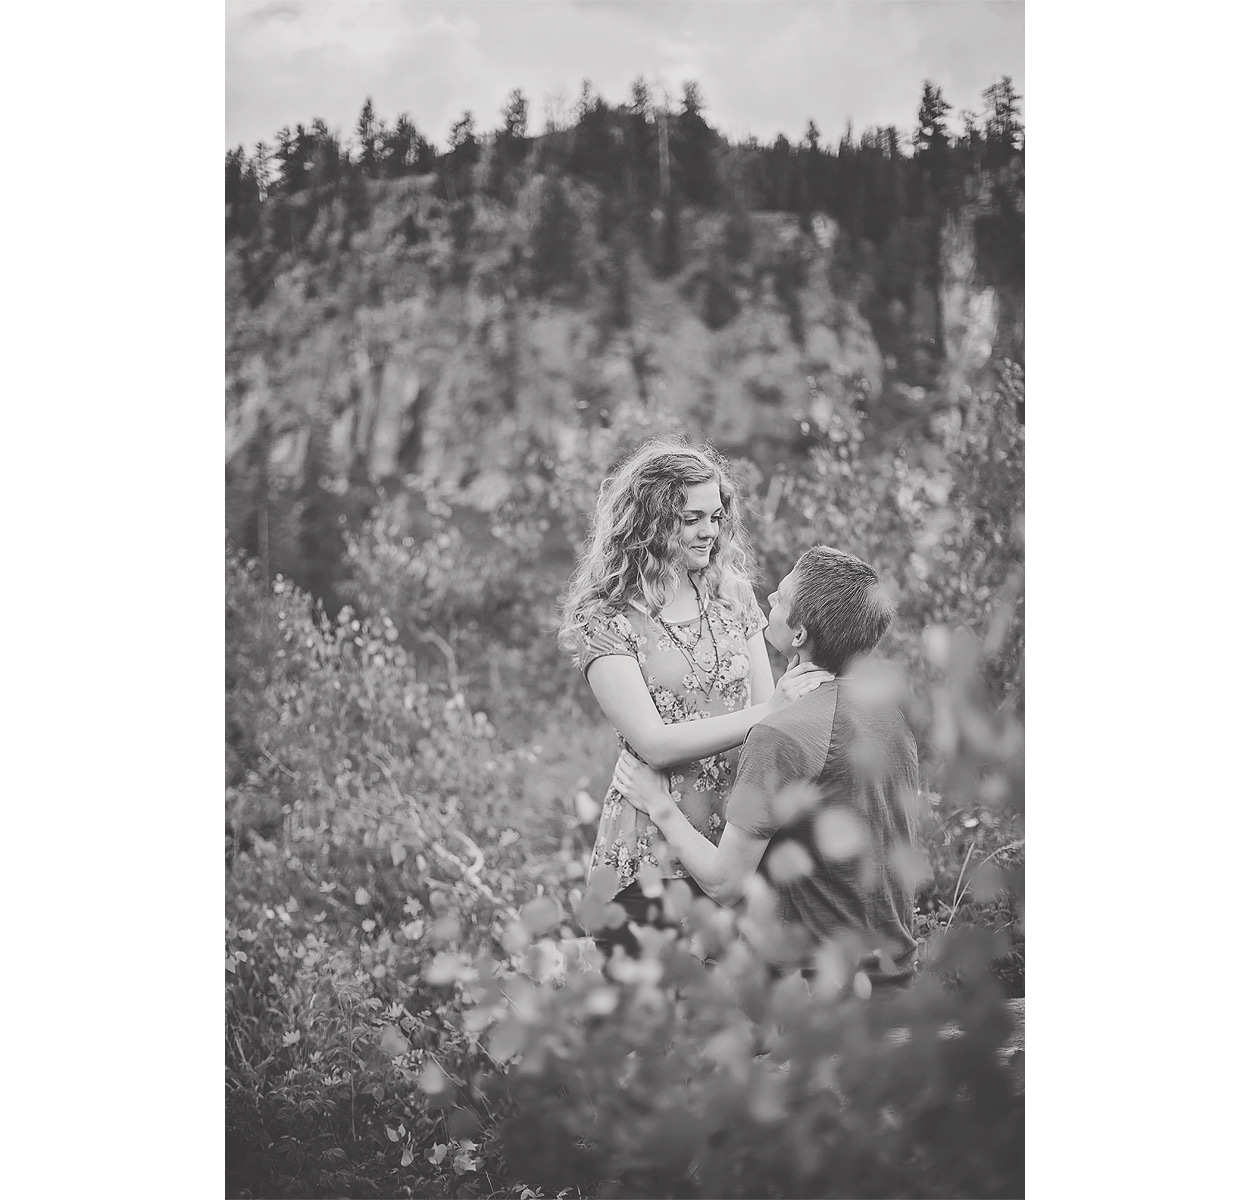 LoganUtahEngagementPhotography-HeidiRandallStudios-LindsaySpencer-9.jpg